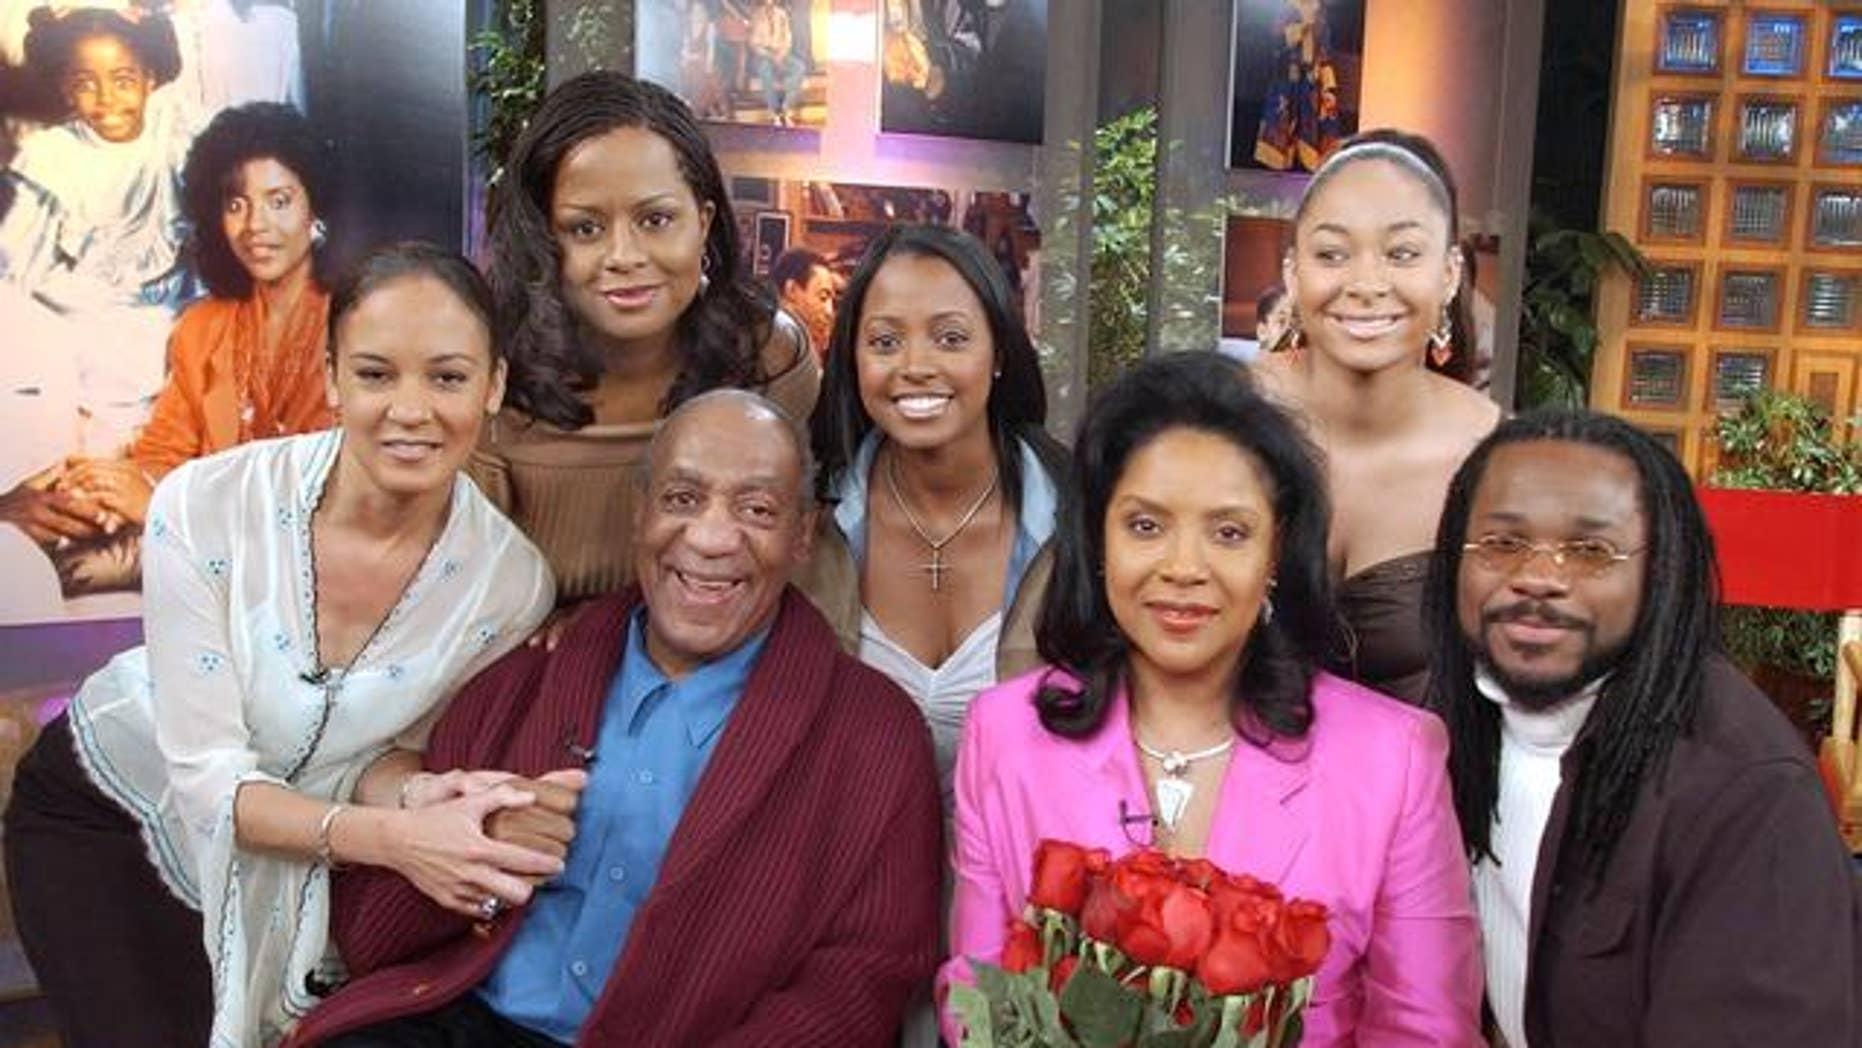 """The Cosby Show"" cast: Sabrina Le Beuff, Tempestt Bledsoe, Bill Cosby, Keshia Knight Pulliam, Phylicia Rashad, Raven Symone and Malcolm Jamal Warner (l-r). (AP)"